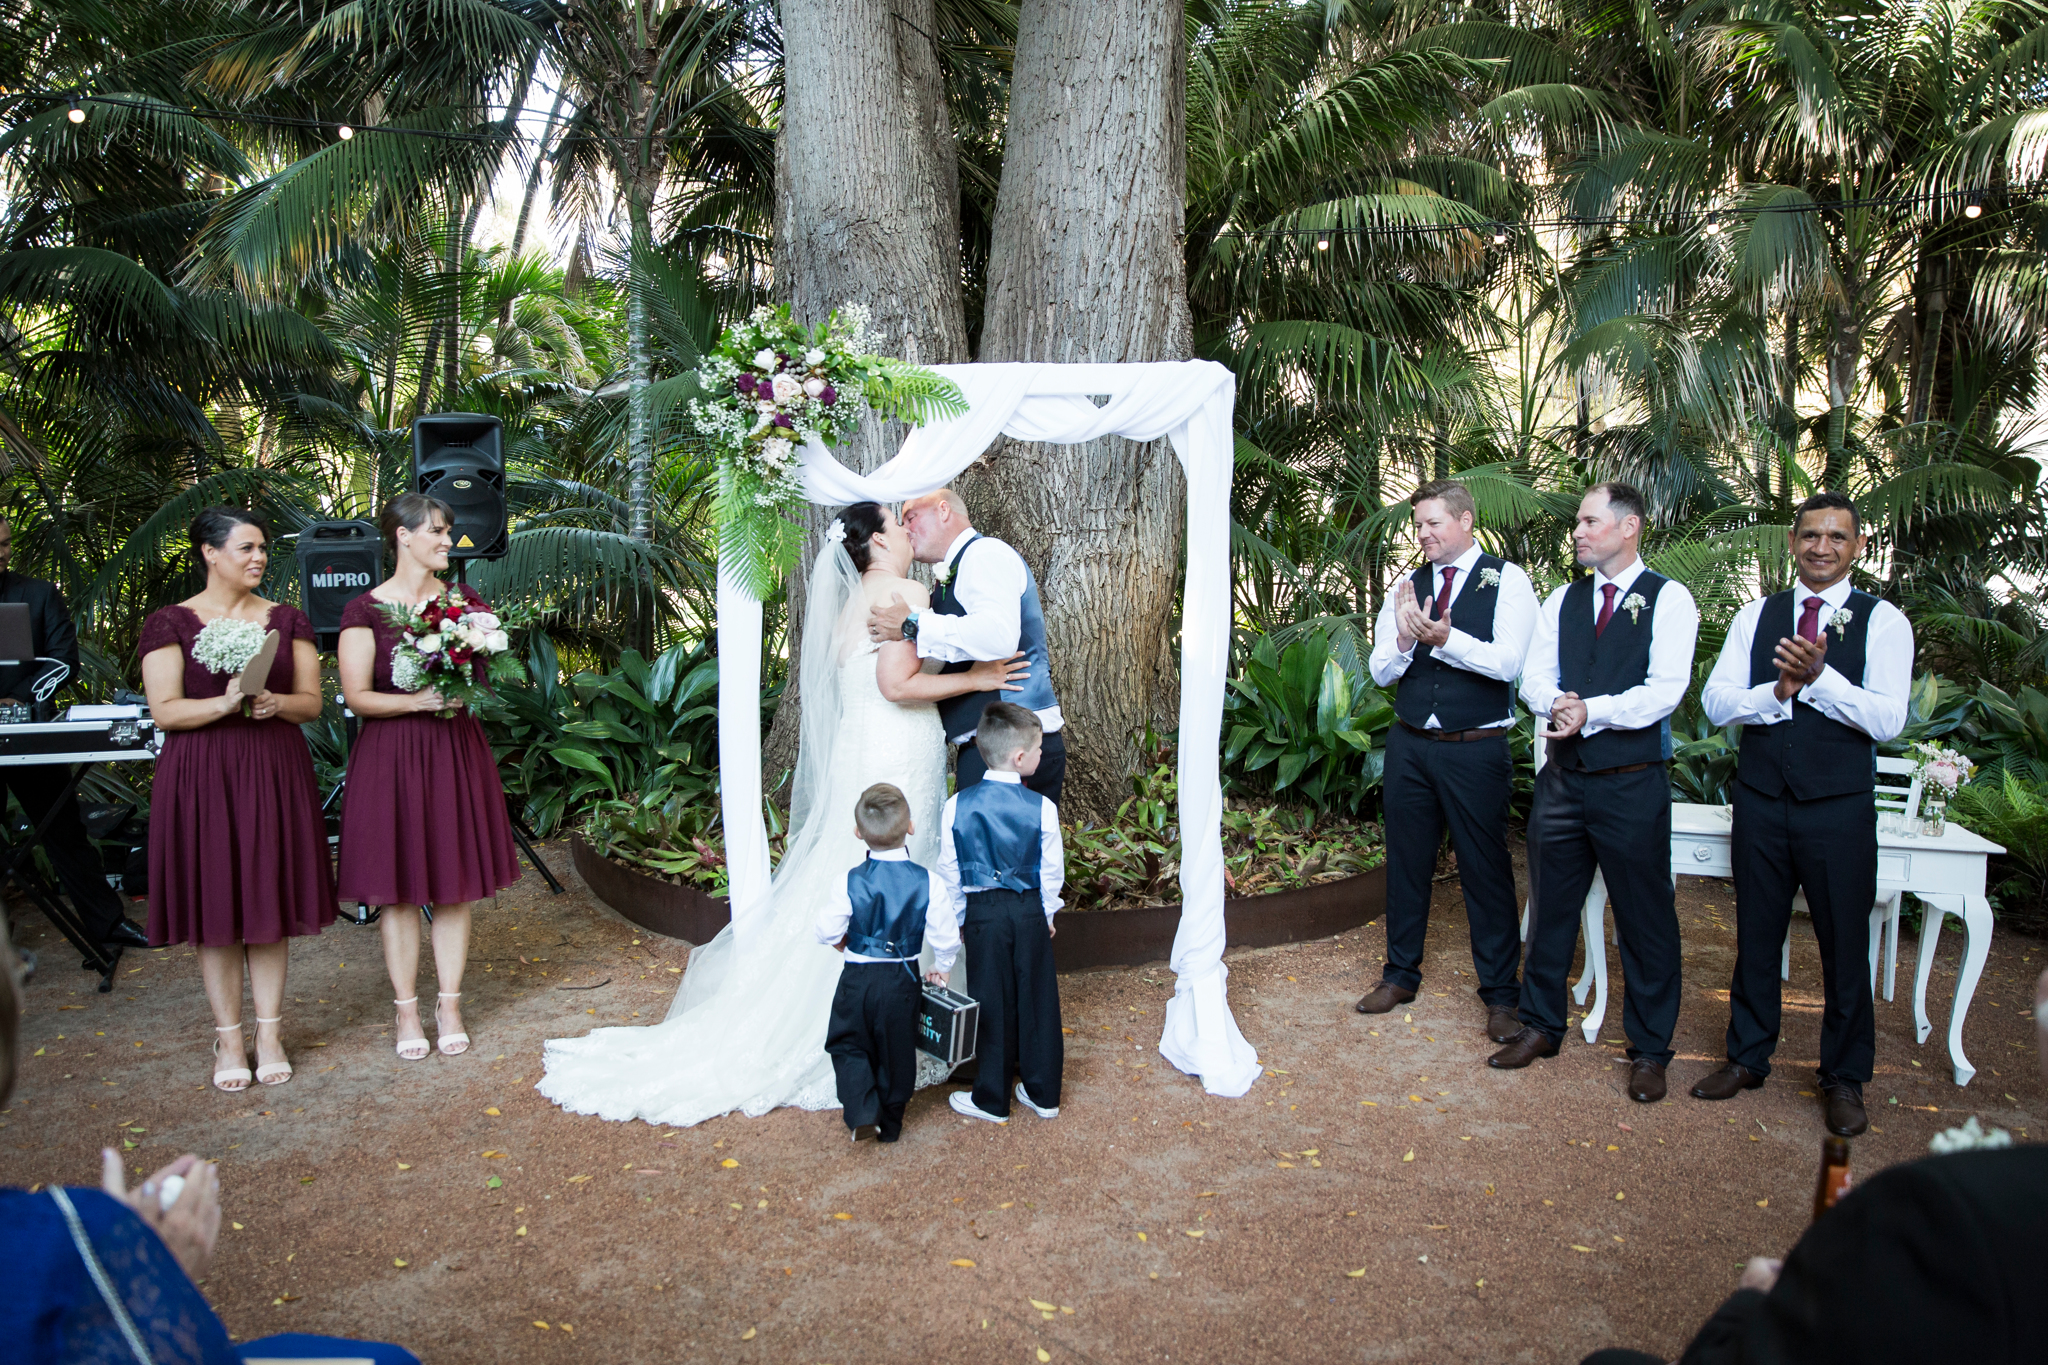 Kyme-steve-wedding-102.jpg